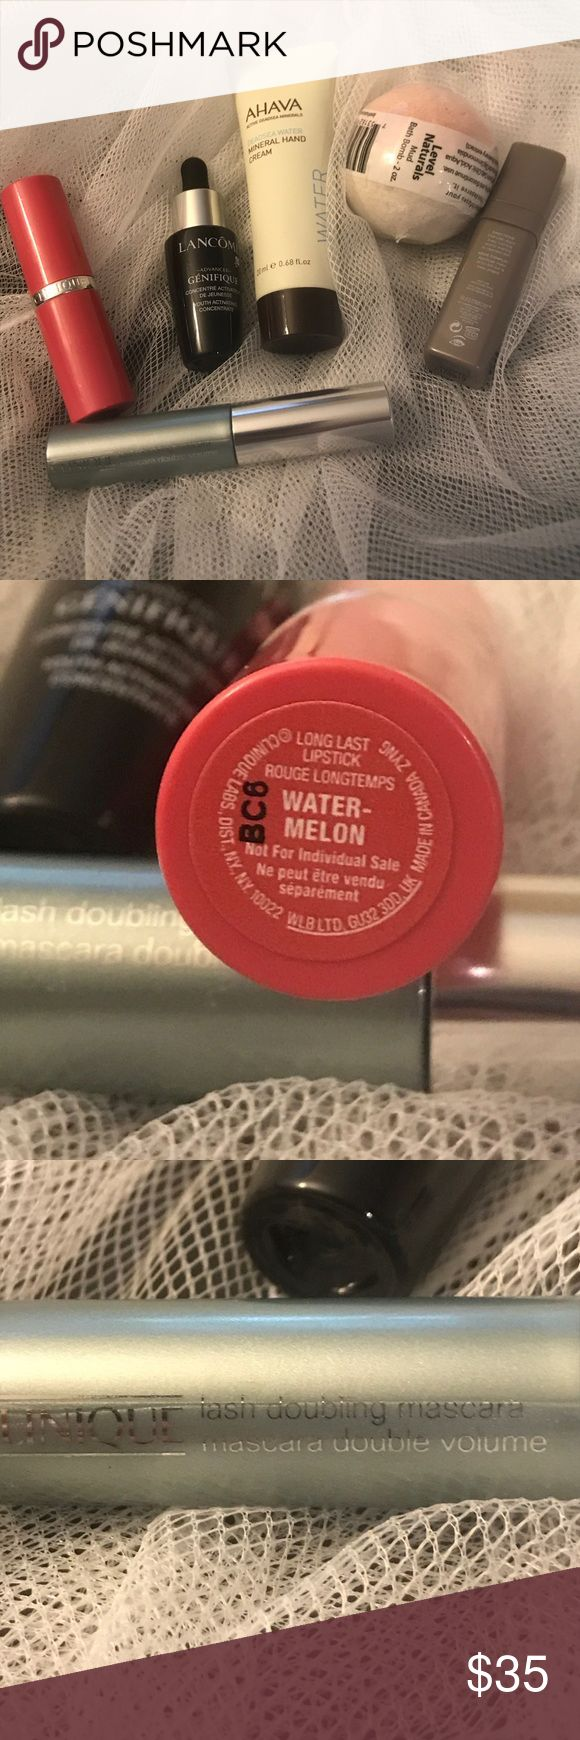 High End Make Up & Skincare Lot 1. Clinique Long Last Lipstick in Watermelon & Lash Doubling Mascara in black 2. Lancôme Advanced Genefique 3. Ahava Mineral Hand Cream 4. Laura Mercier Flawless Skin Eye Serum 5. Level Naturals Mud Bath Bomb Makeup